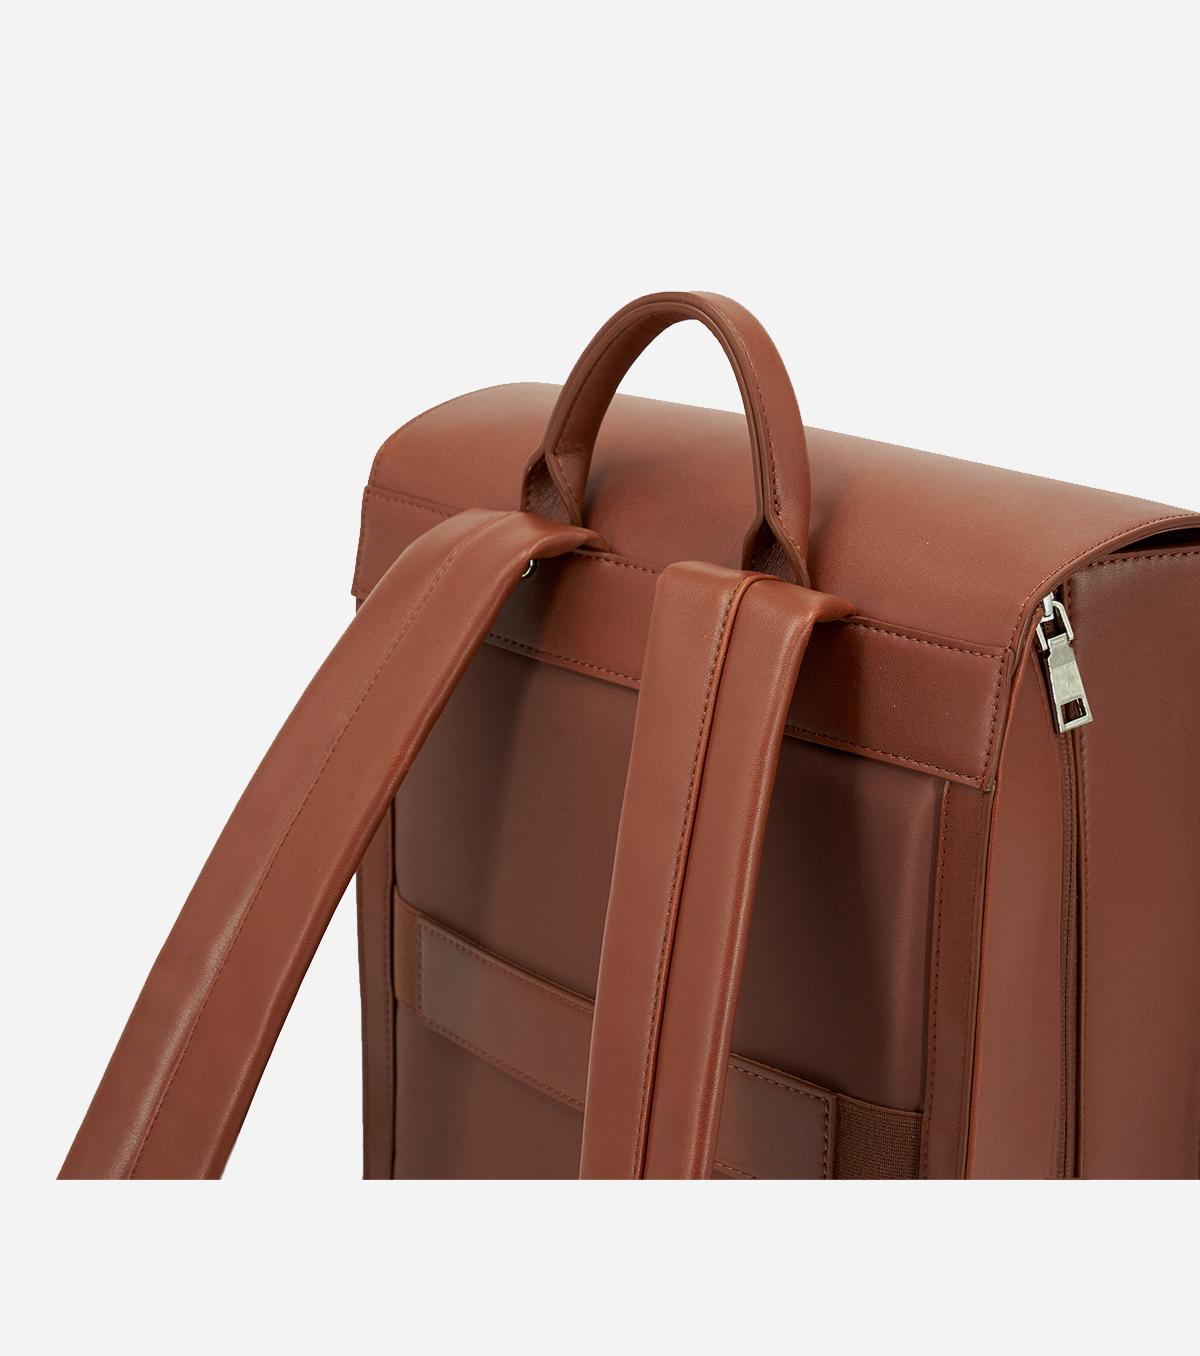 randoseru bag brown